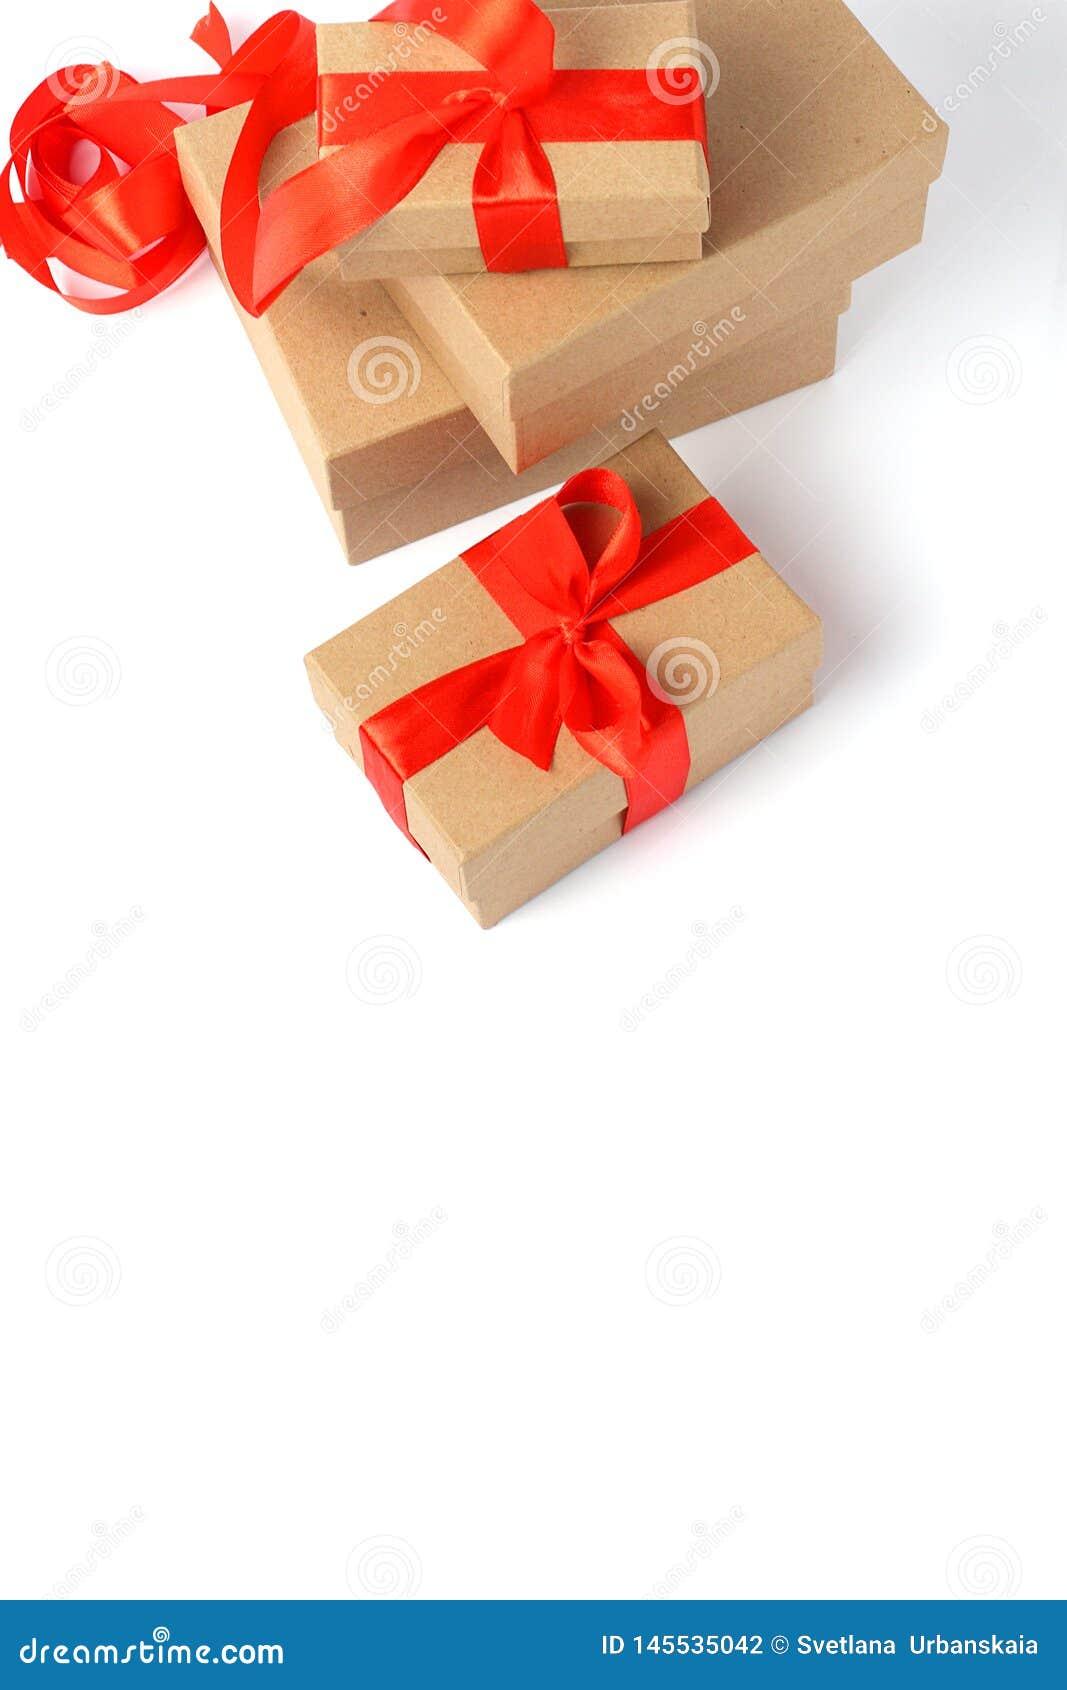 Caixa de presente envolvida com curva da fita